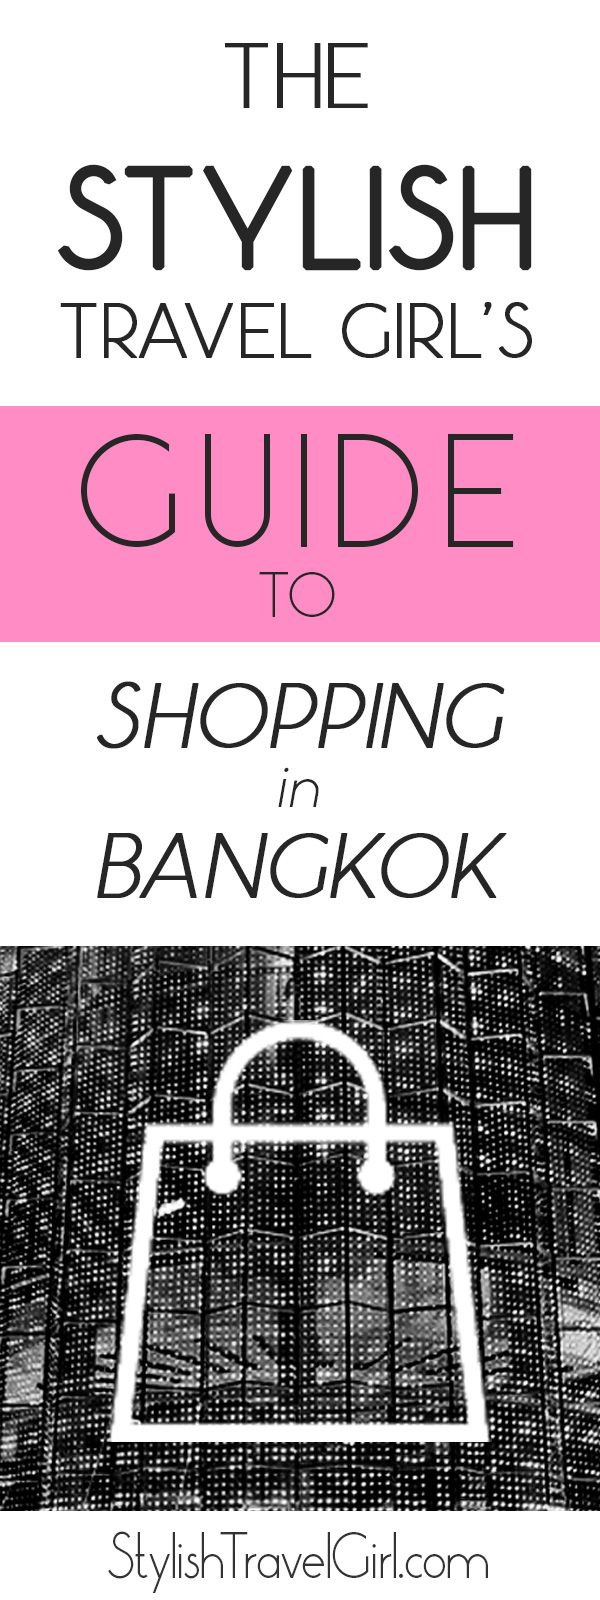 The Stylish Travel Girls Guide to Shopping in Bangkok for all Budgets on stylishtravelgirl.com